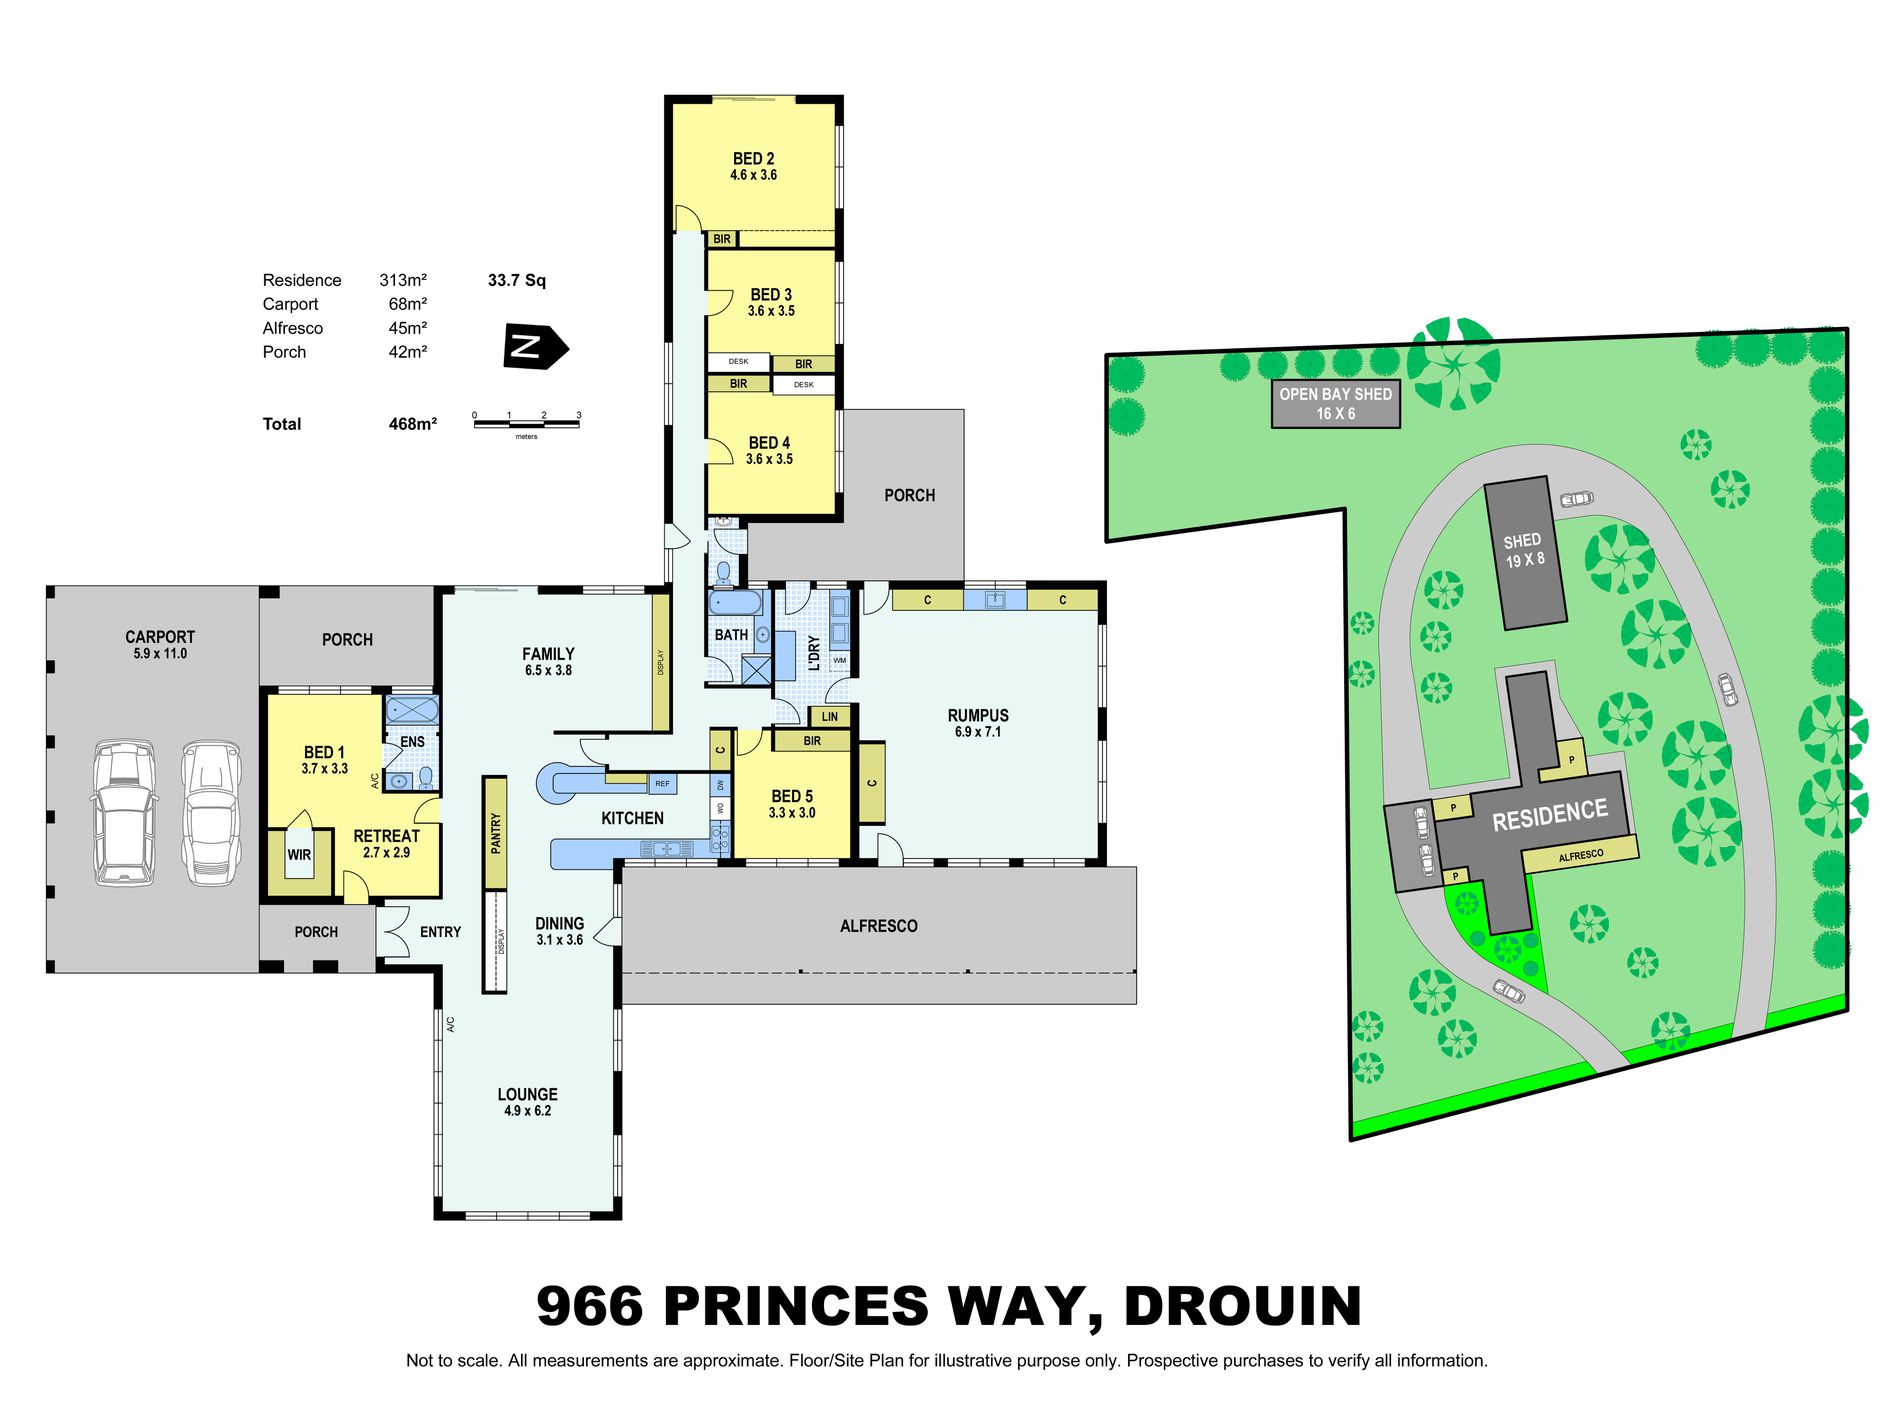 966 Princes Way, Drouin